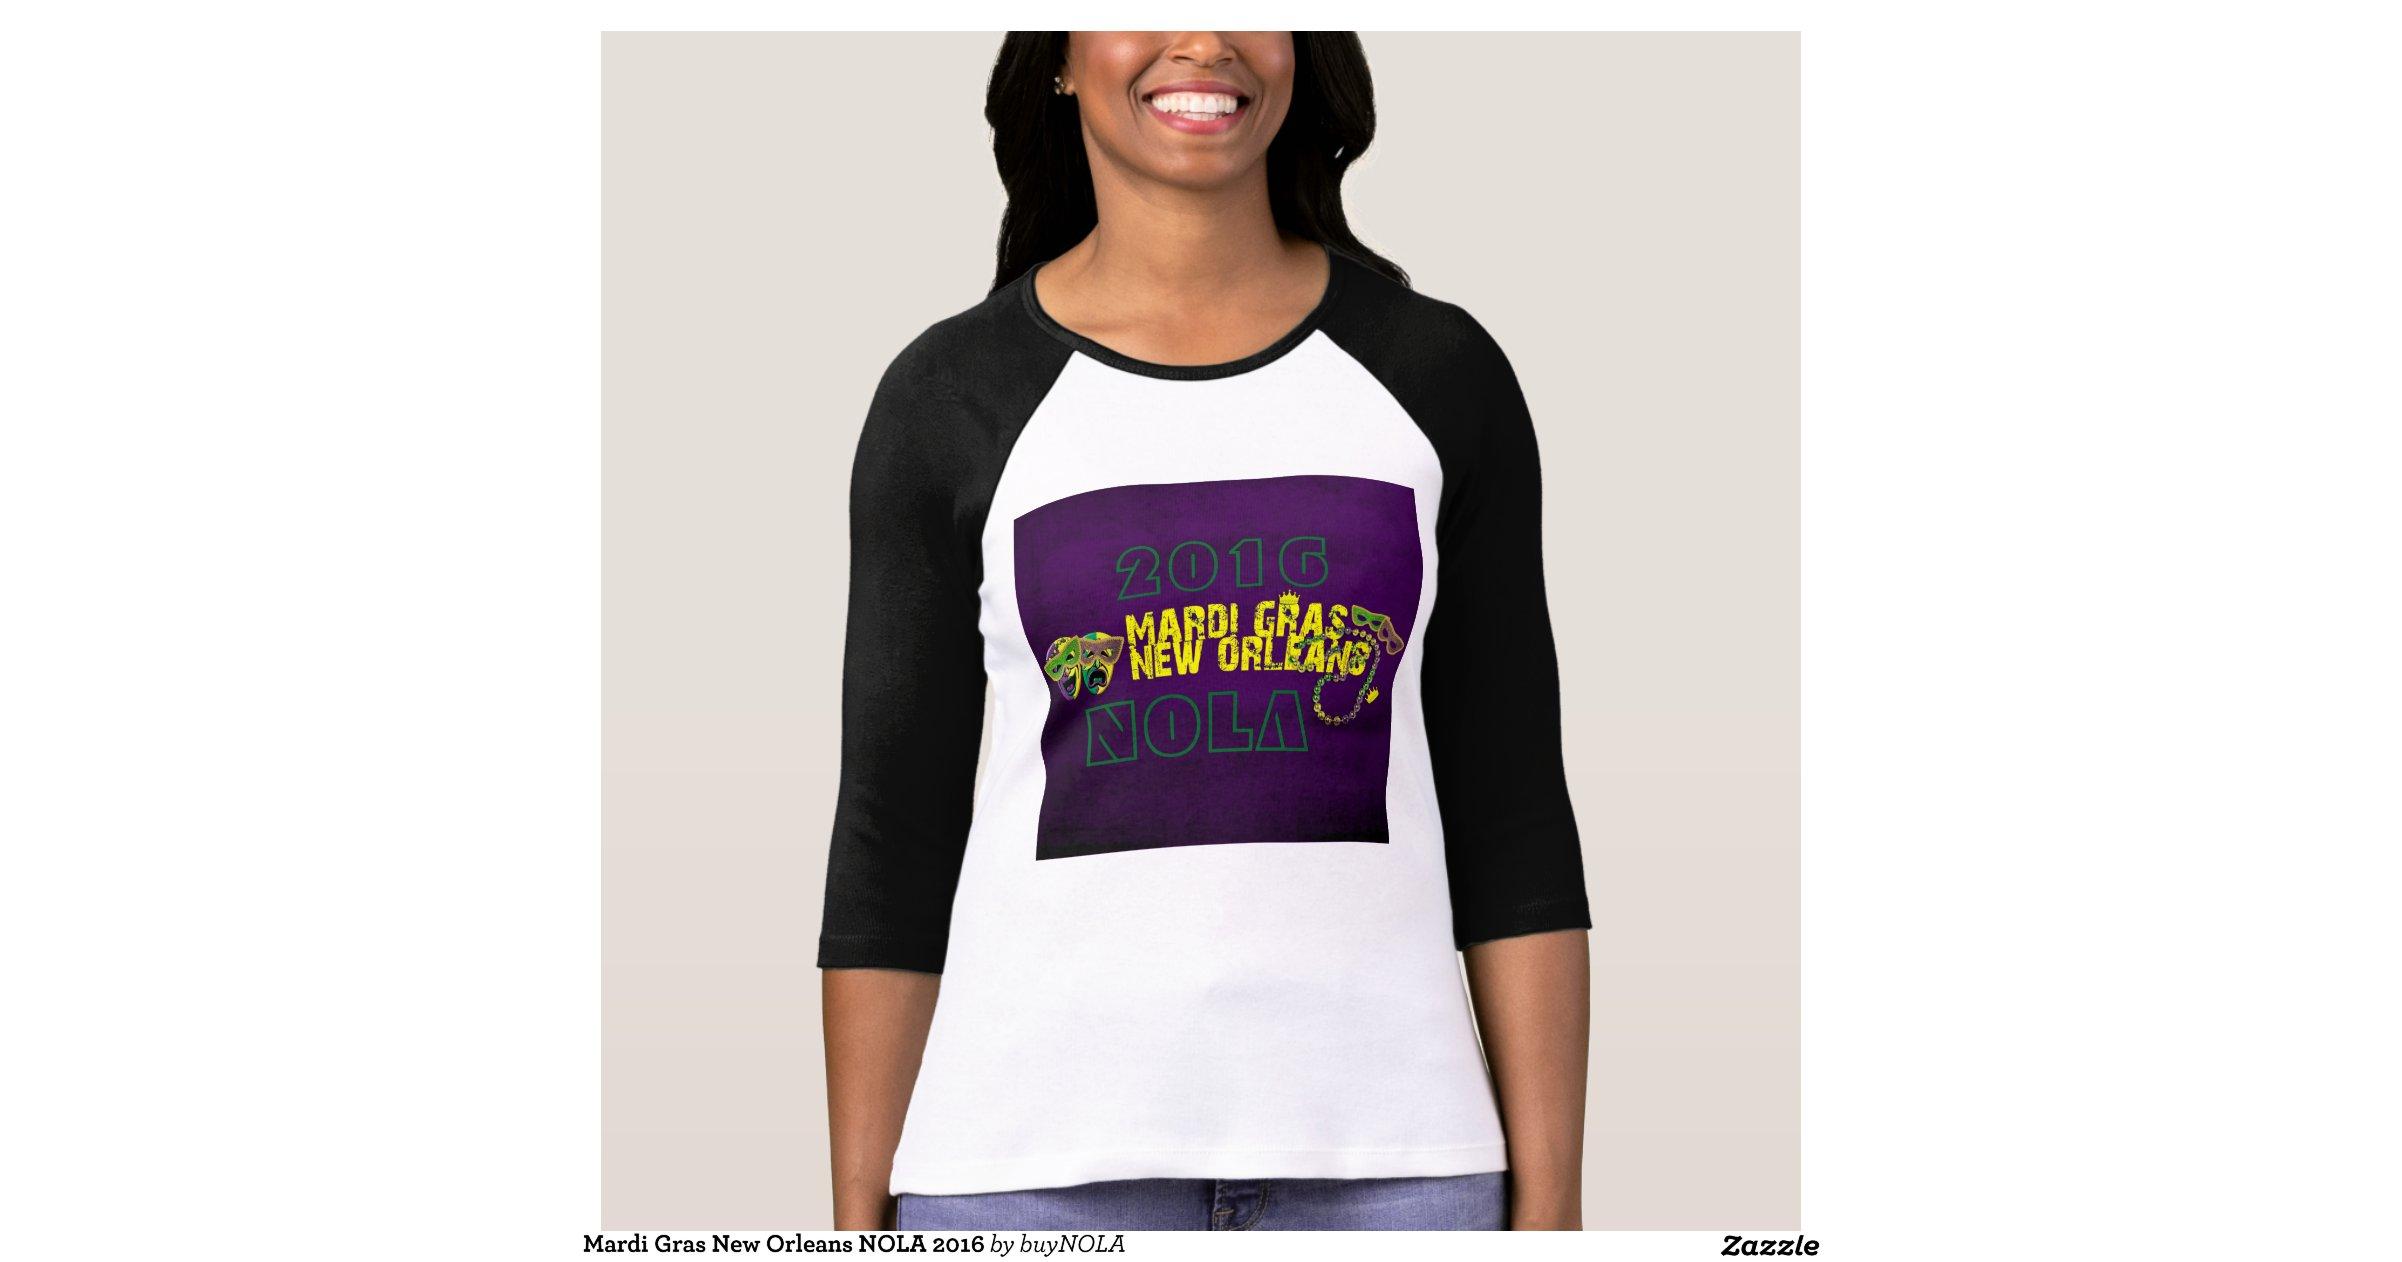 Mardi Gras New Orleans Nola 2016 Tshirts Zazzle